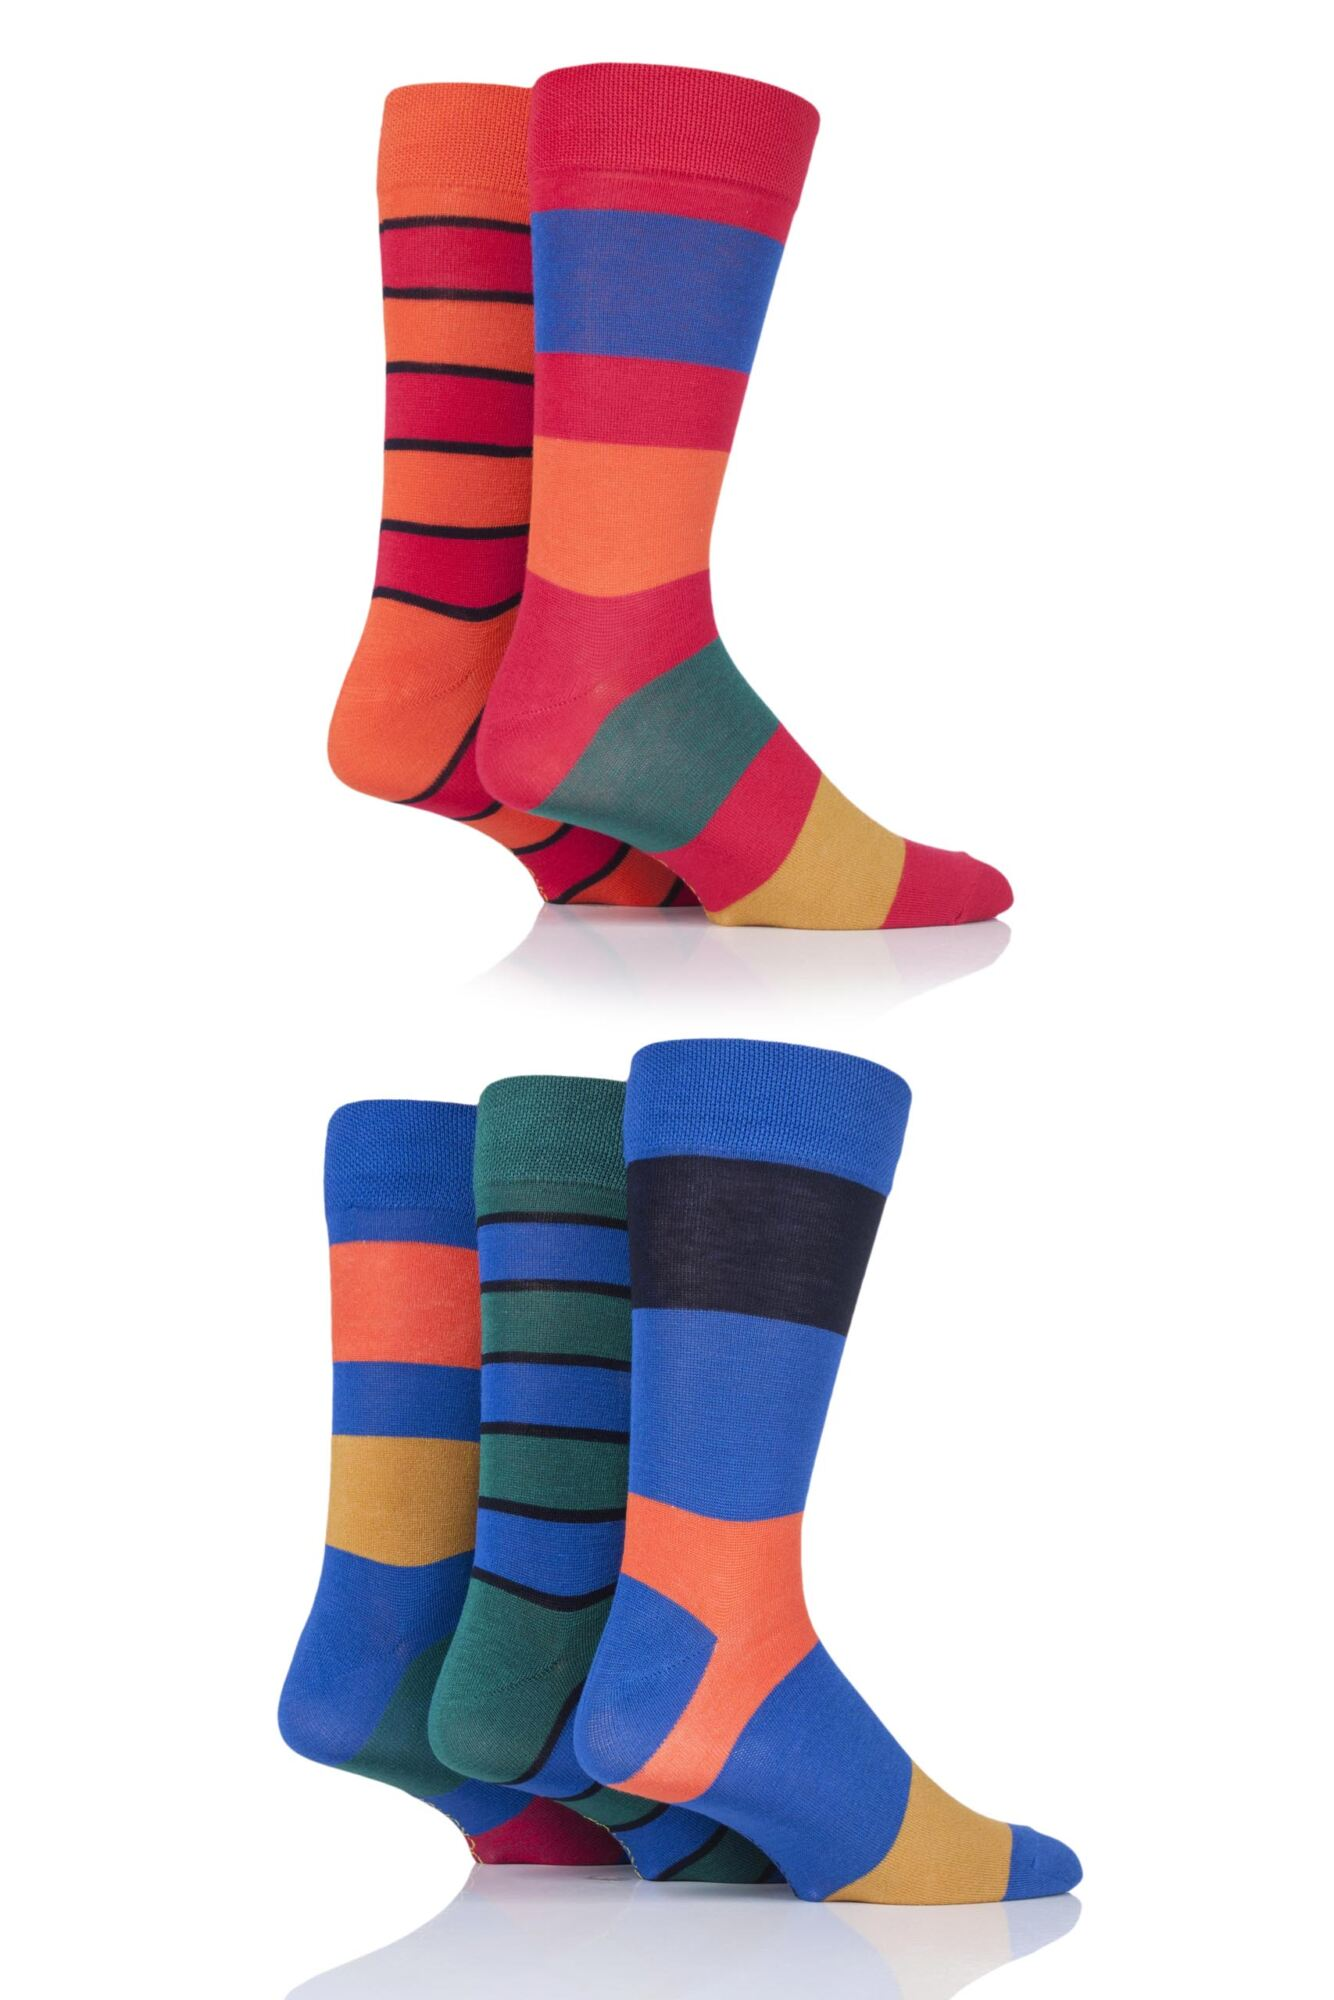 5 Pair Plain, Striped and Patterned Bamboo Socks Men's - SOCKSHOP